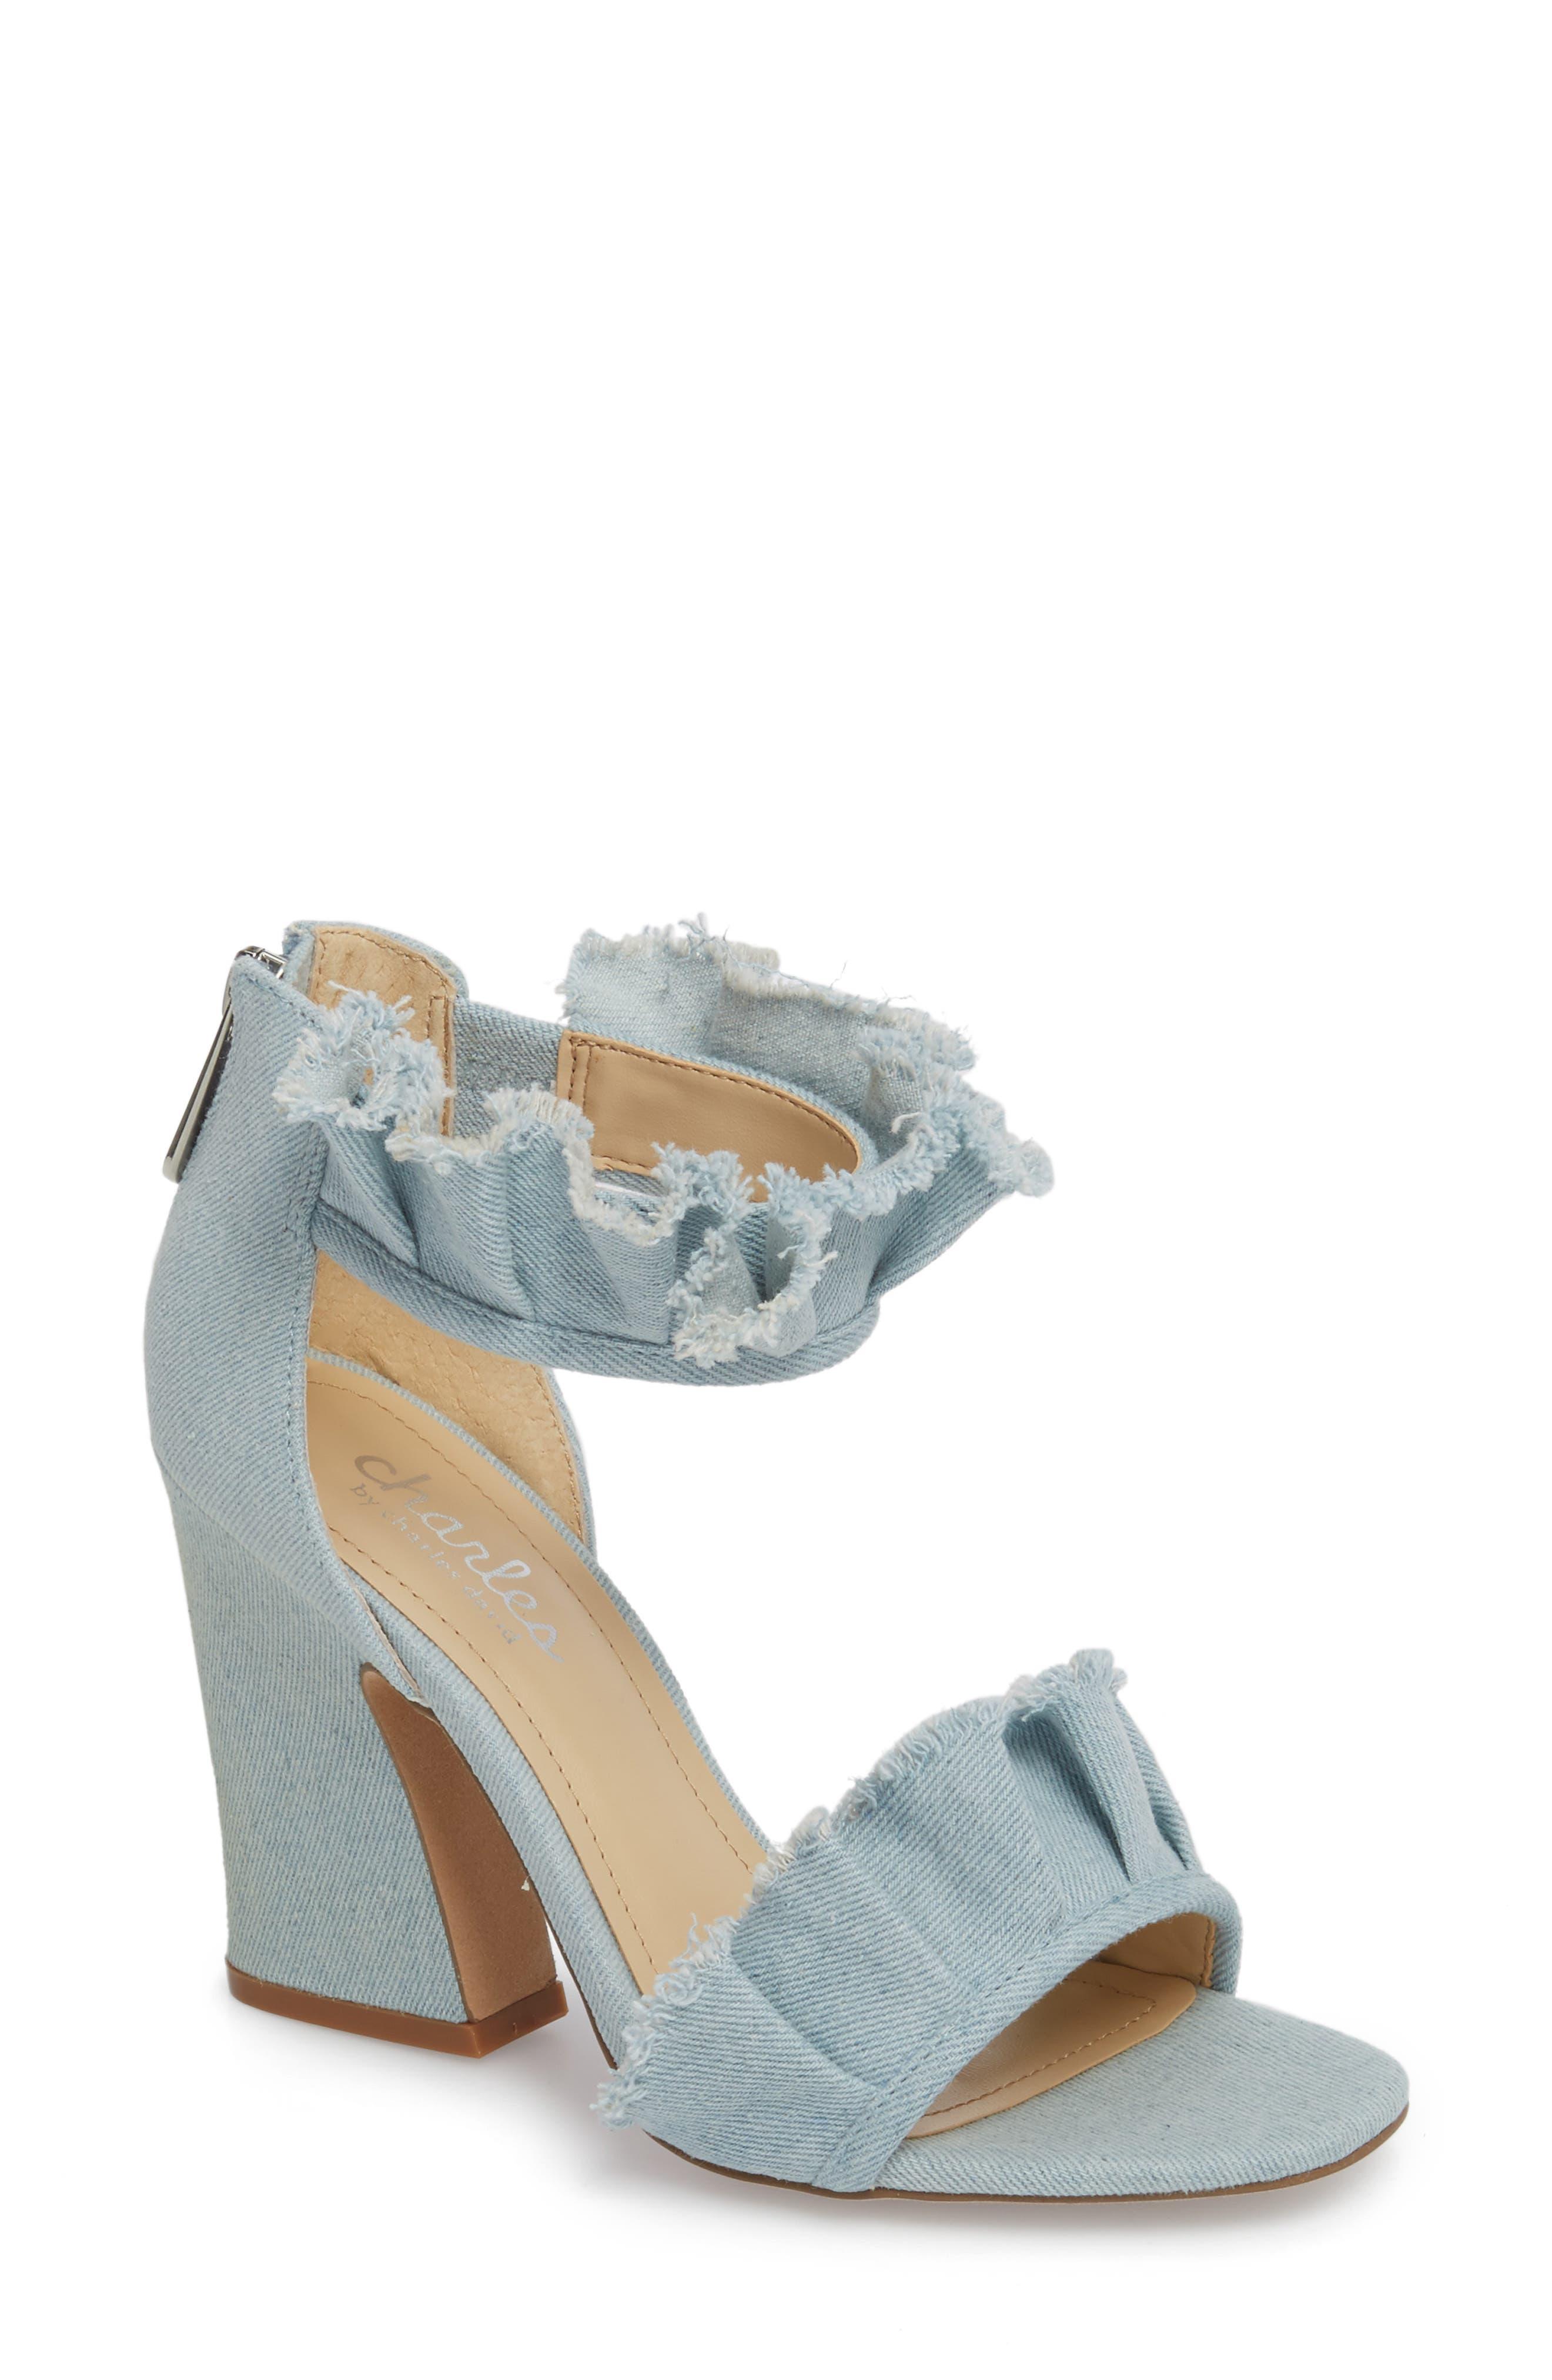 Charles By Charles David Haley Ruffle Sandal, Blue